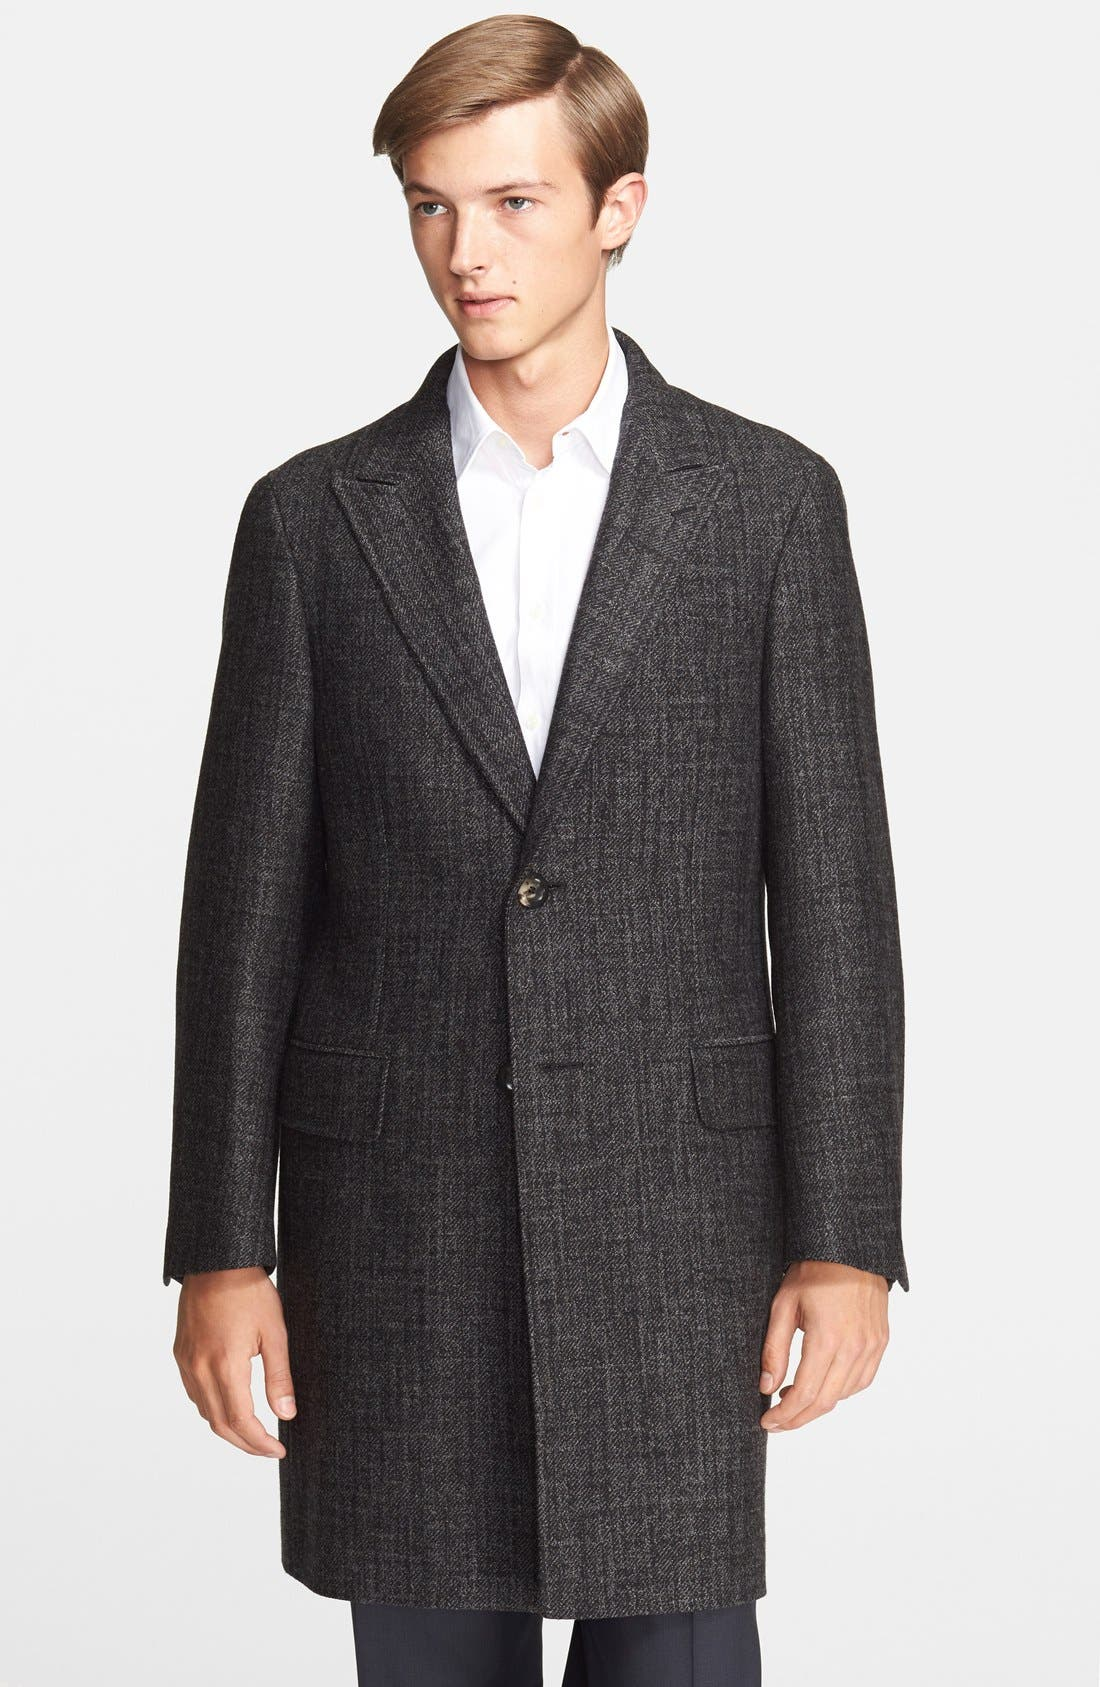 CANALI,                             Plaid Wool Overcoat,                             Main thumbnail 1, color,                             011